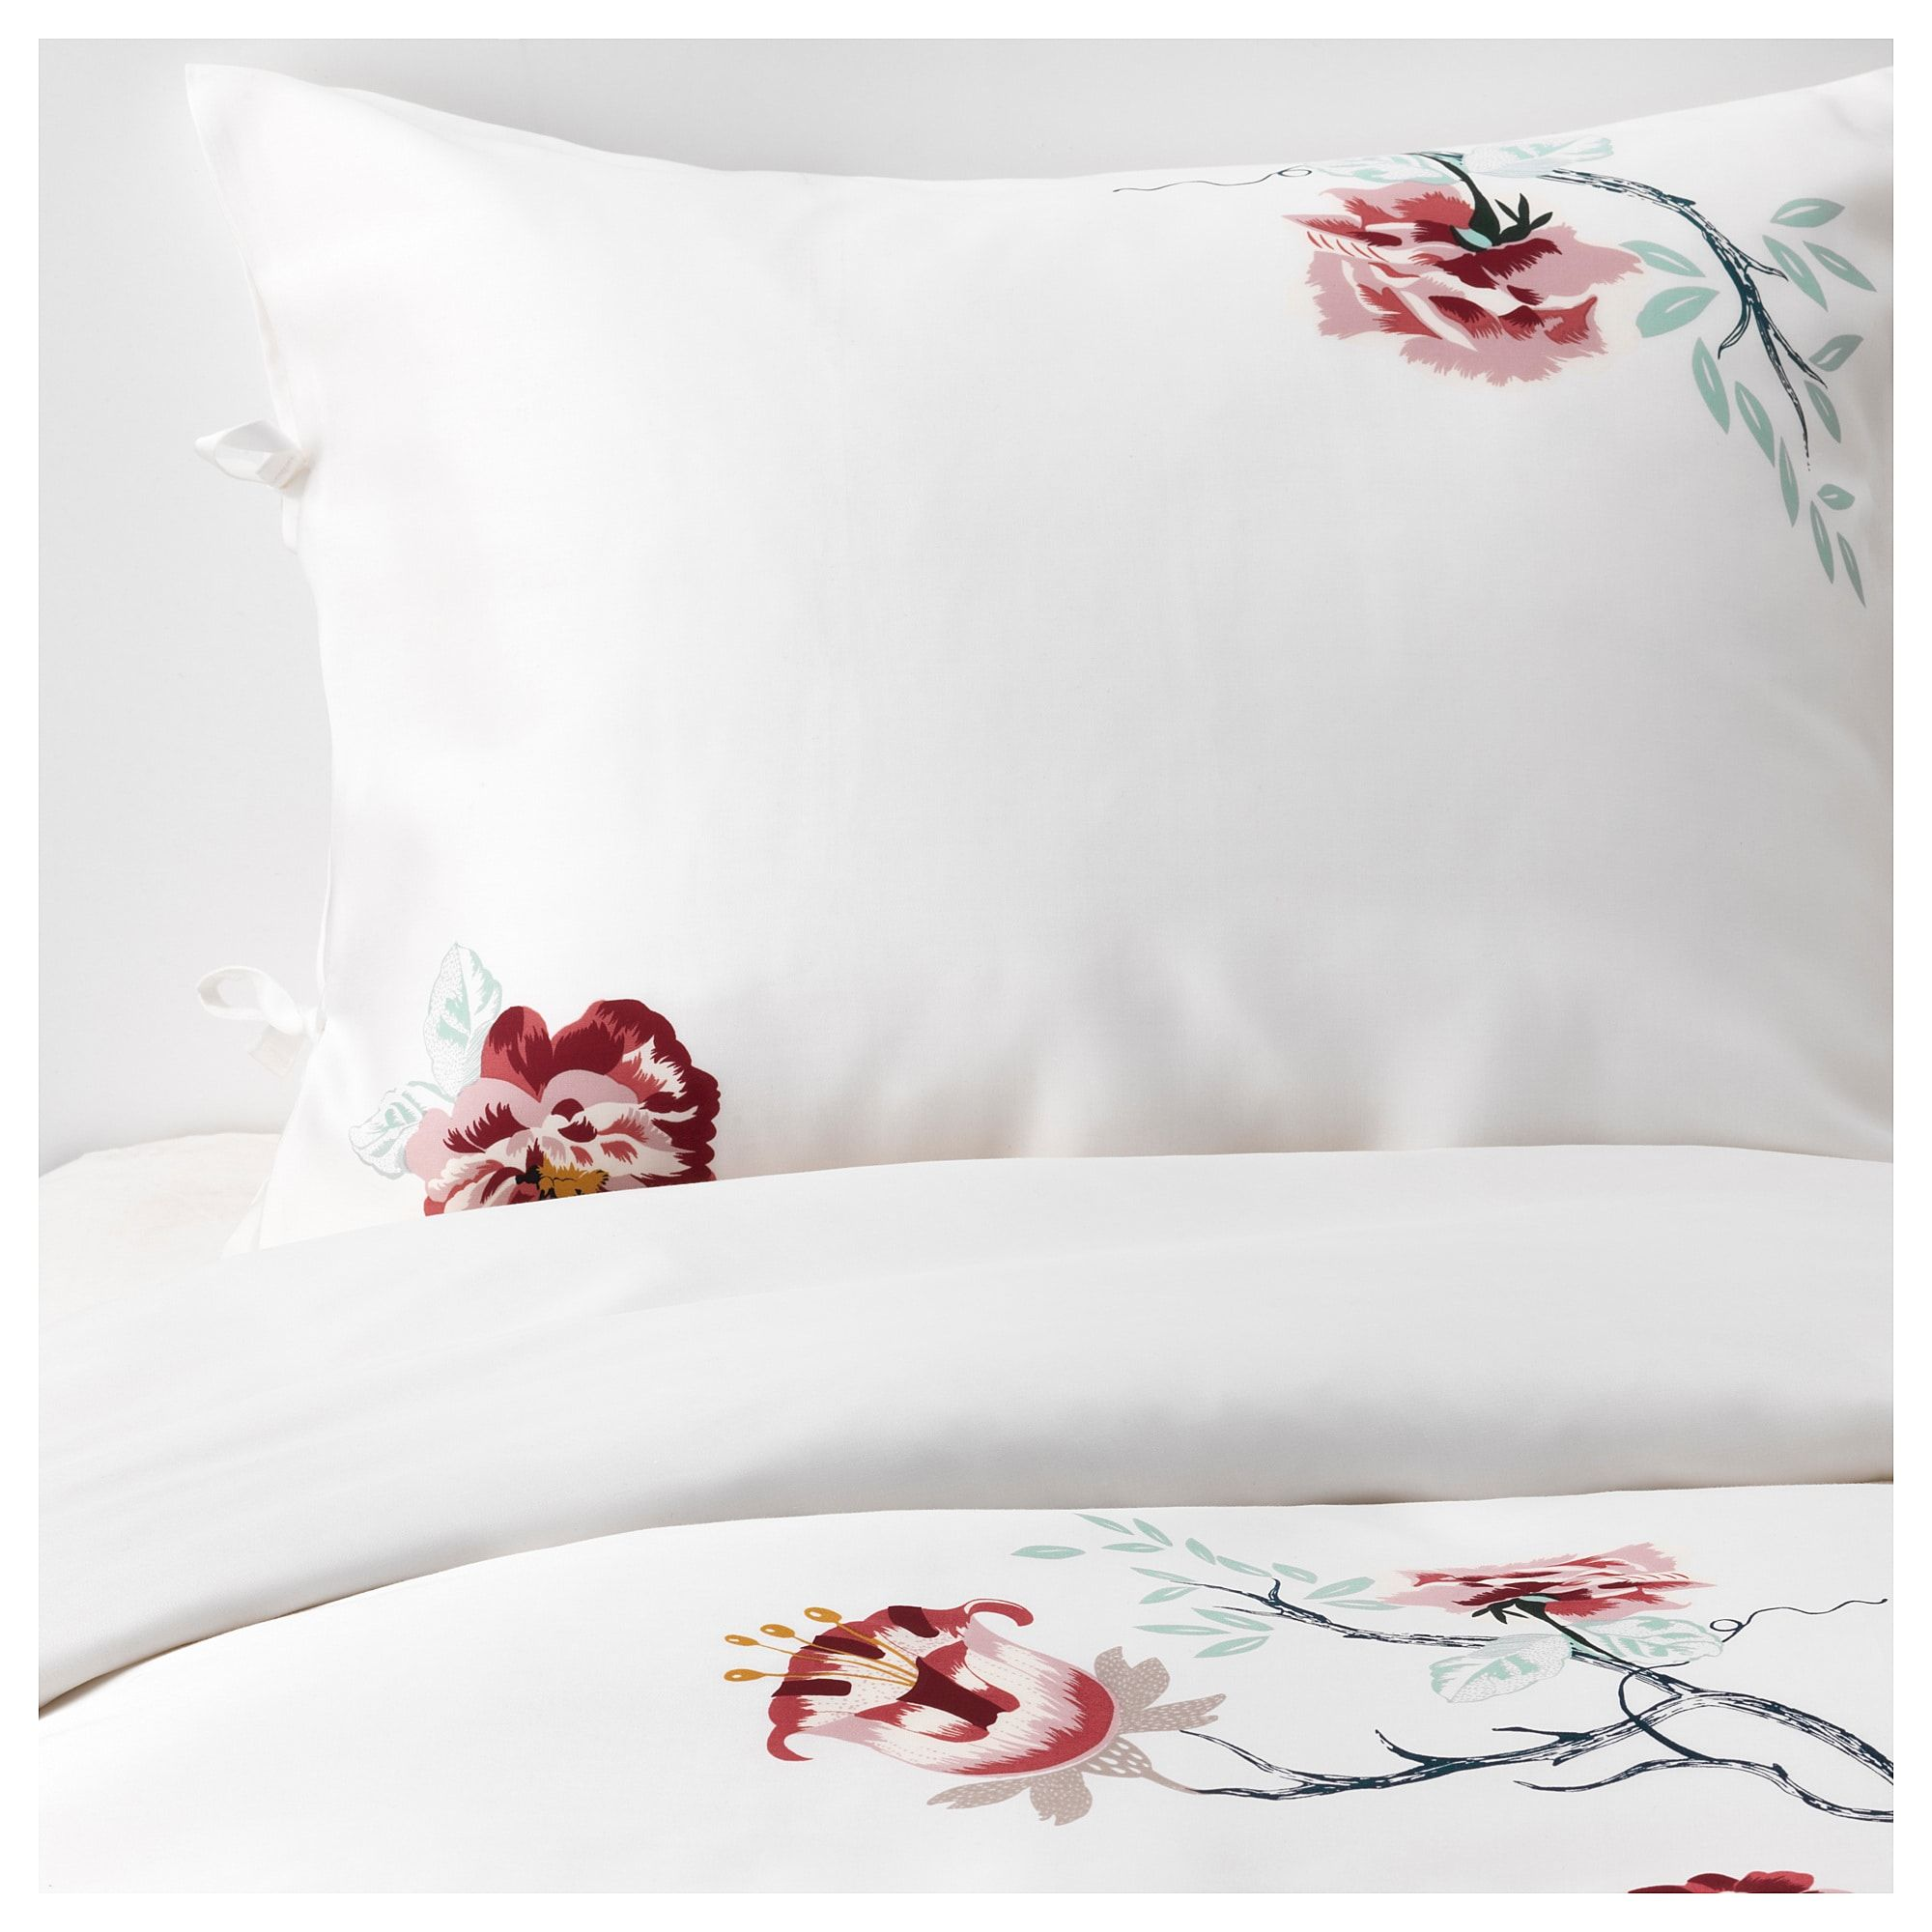 Ikea Jättelilja Housse De Couette Et Taie S Blanc à